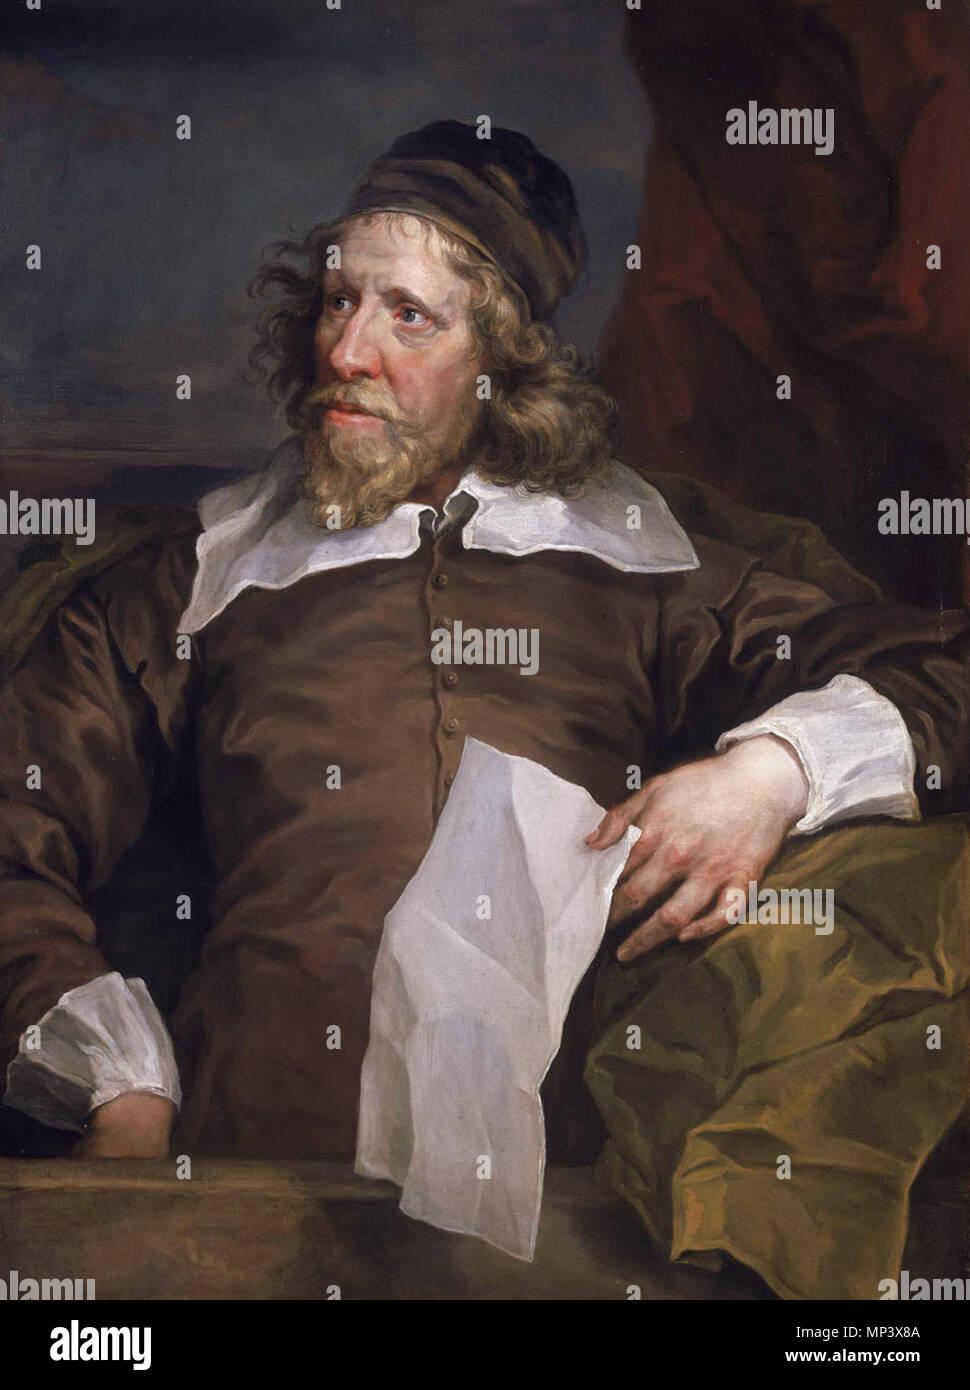 Inigo Jones (1573-1652) *91,5 x 71 cm *1757-1758 Ritratto di Inigo Jones, architetto inglese . 1022 PortraitInigoJones Immagini Stock